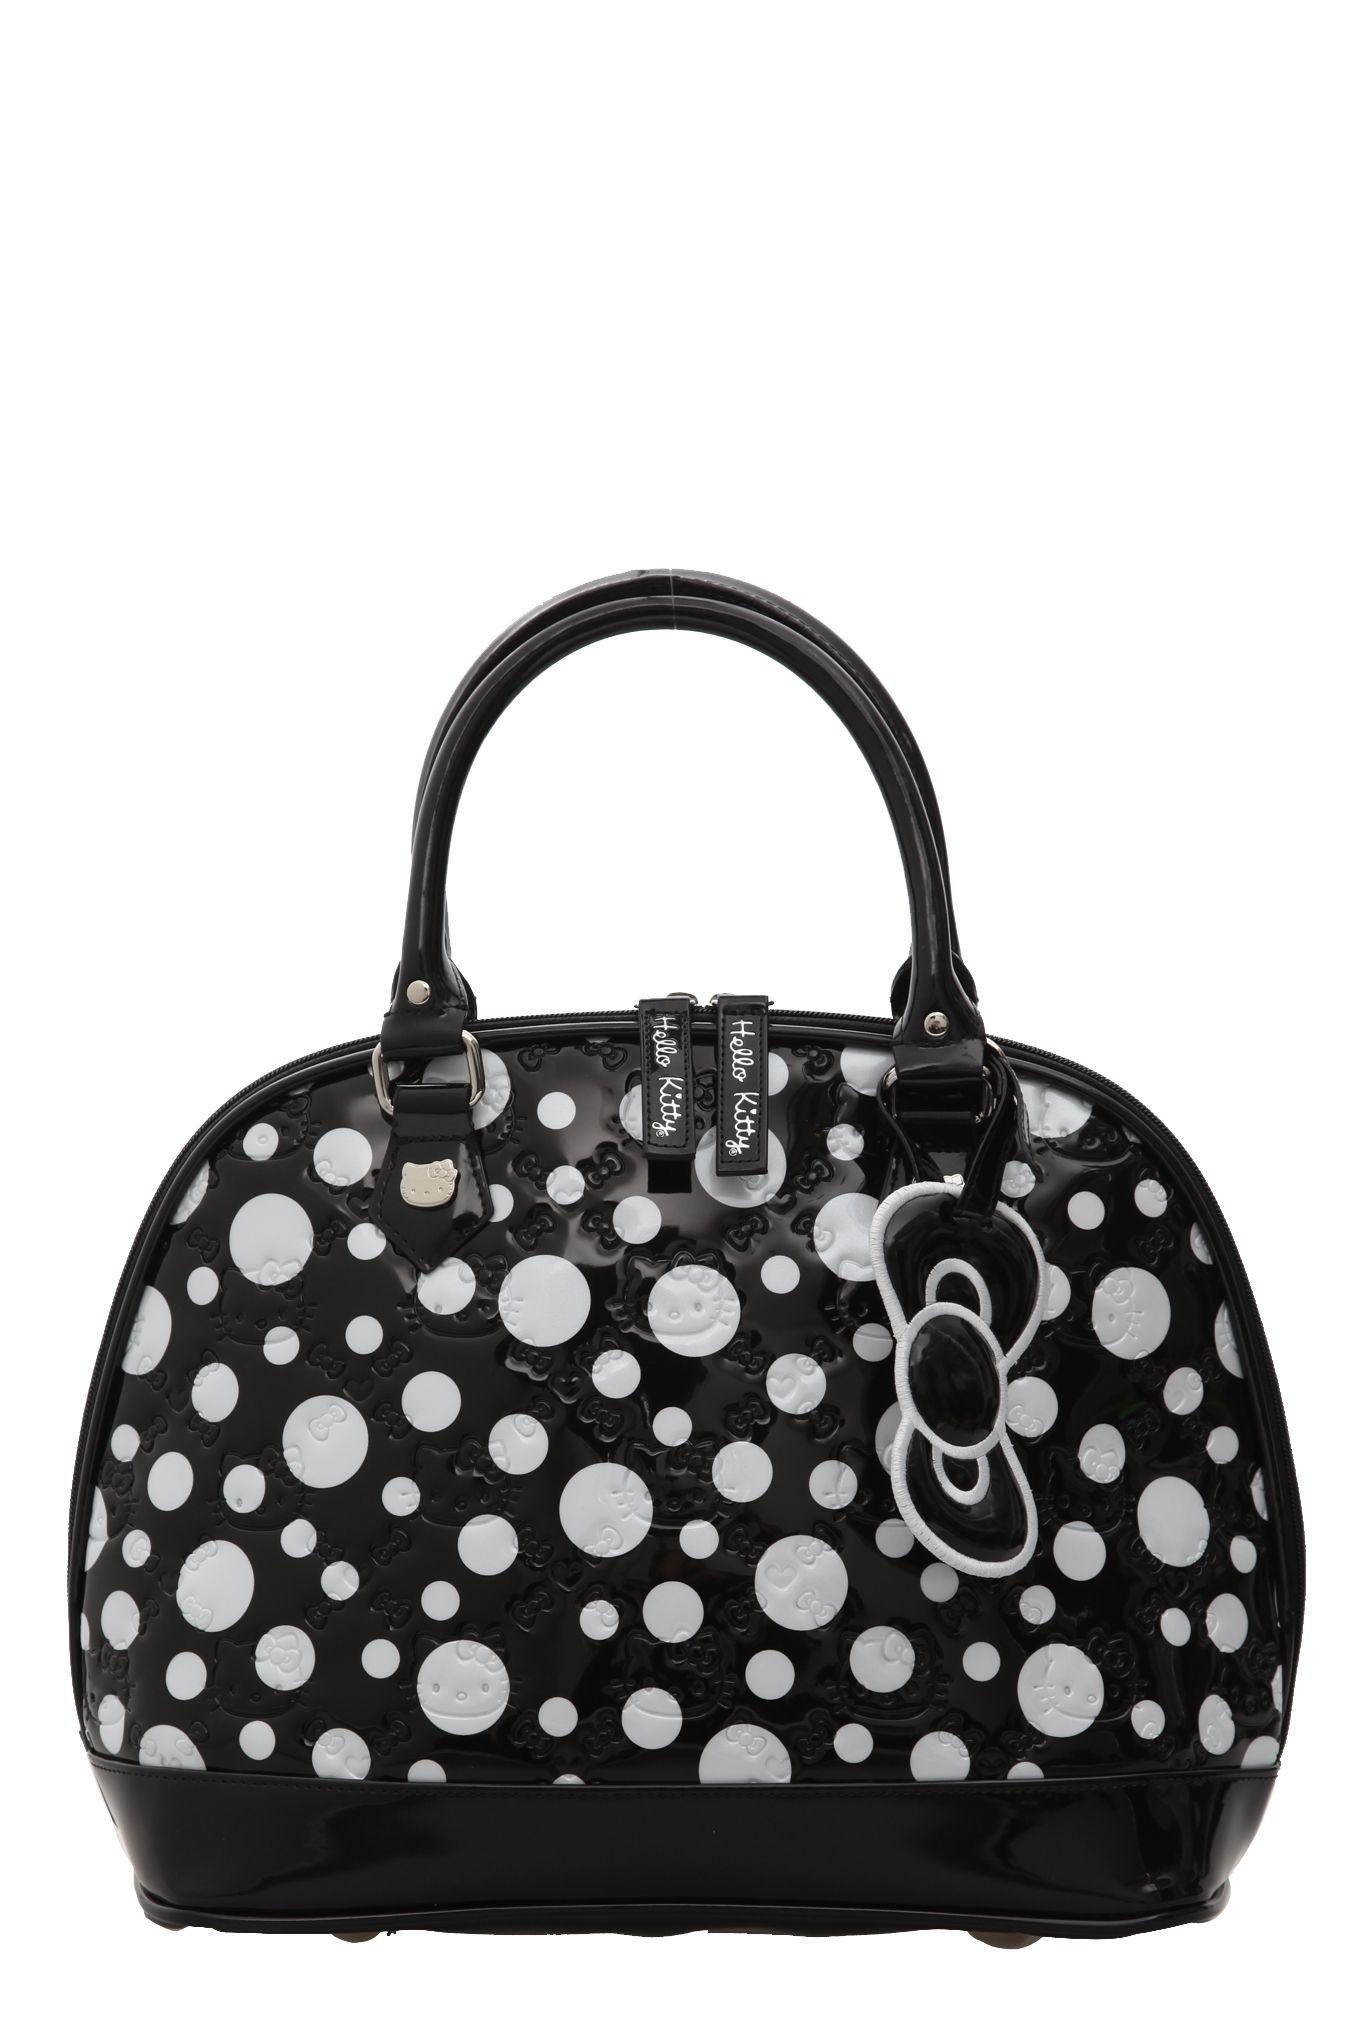 f6caae1718a1 Loungefly Hello Kitty Polka Dot Dome Bag